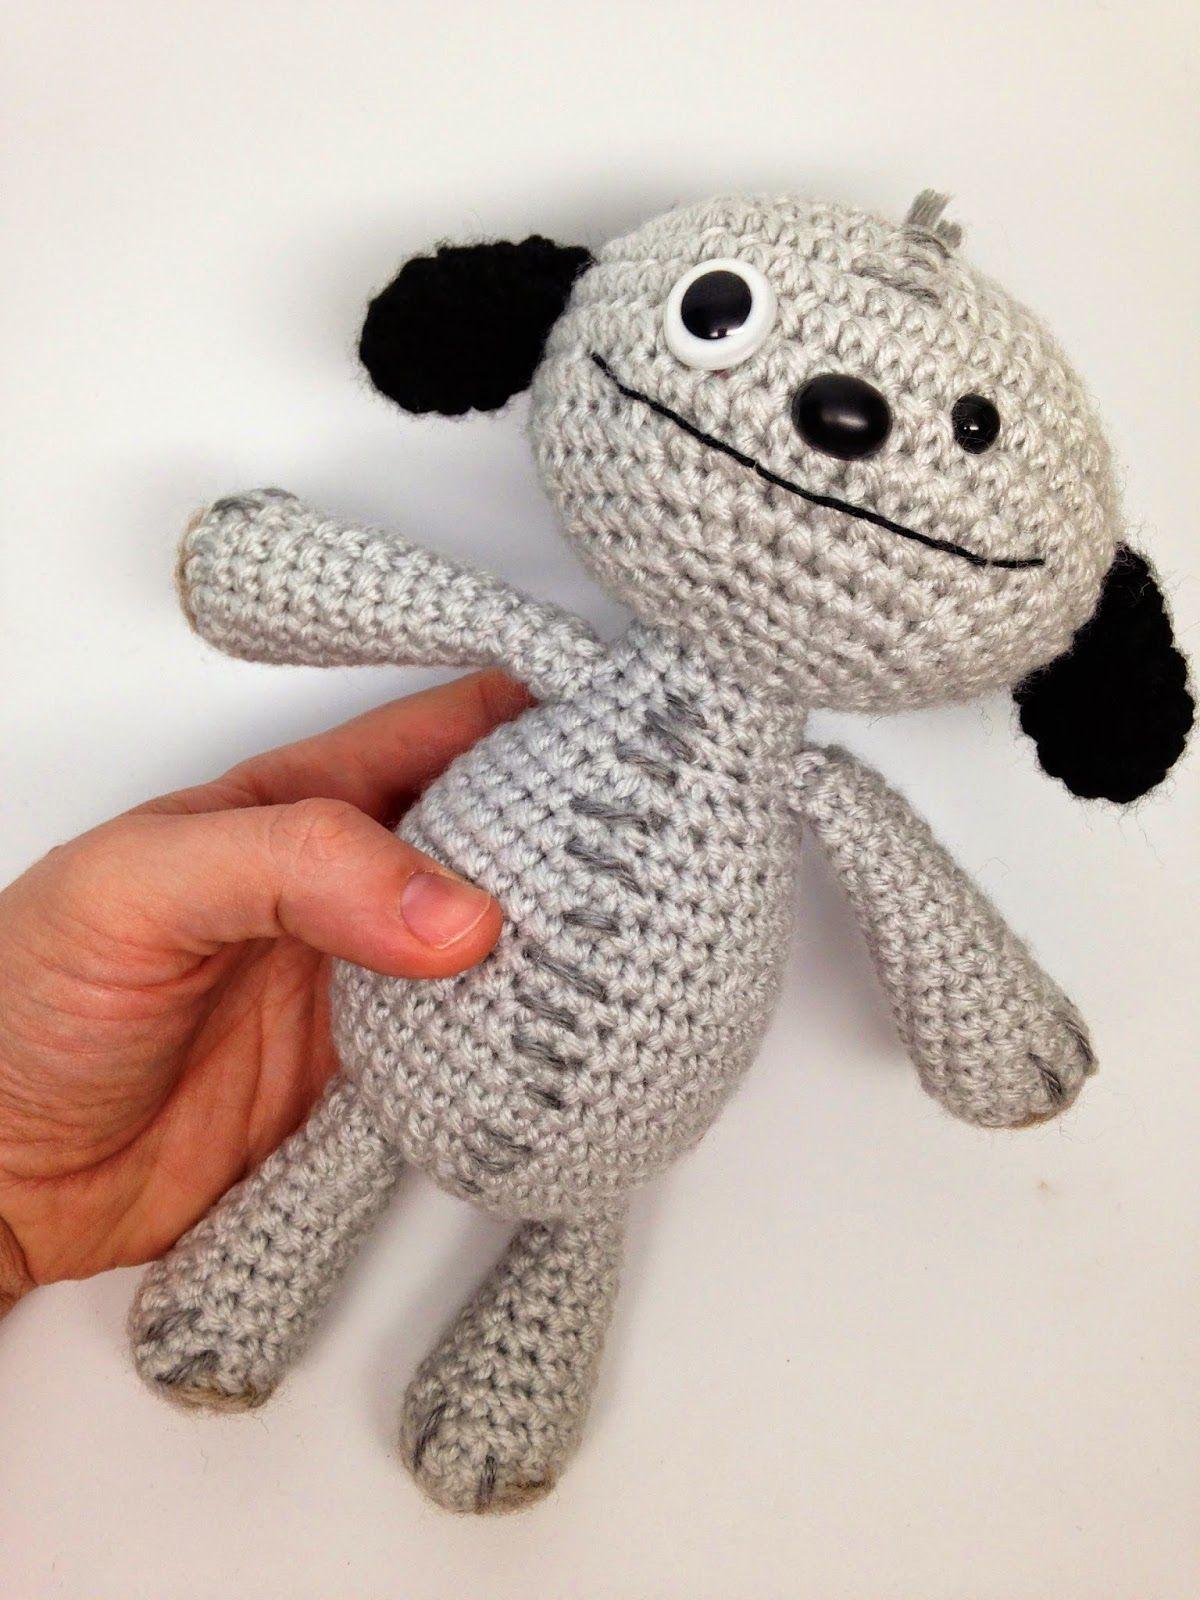 To Russia with Love Bear - Amigurumi. (Free pattern). | Crochet ...